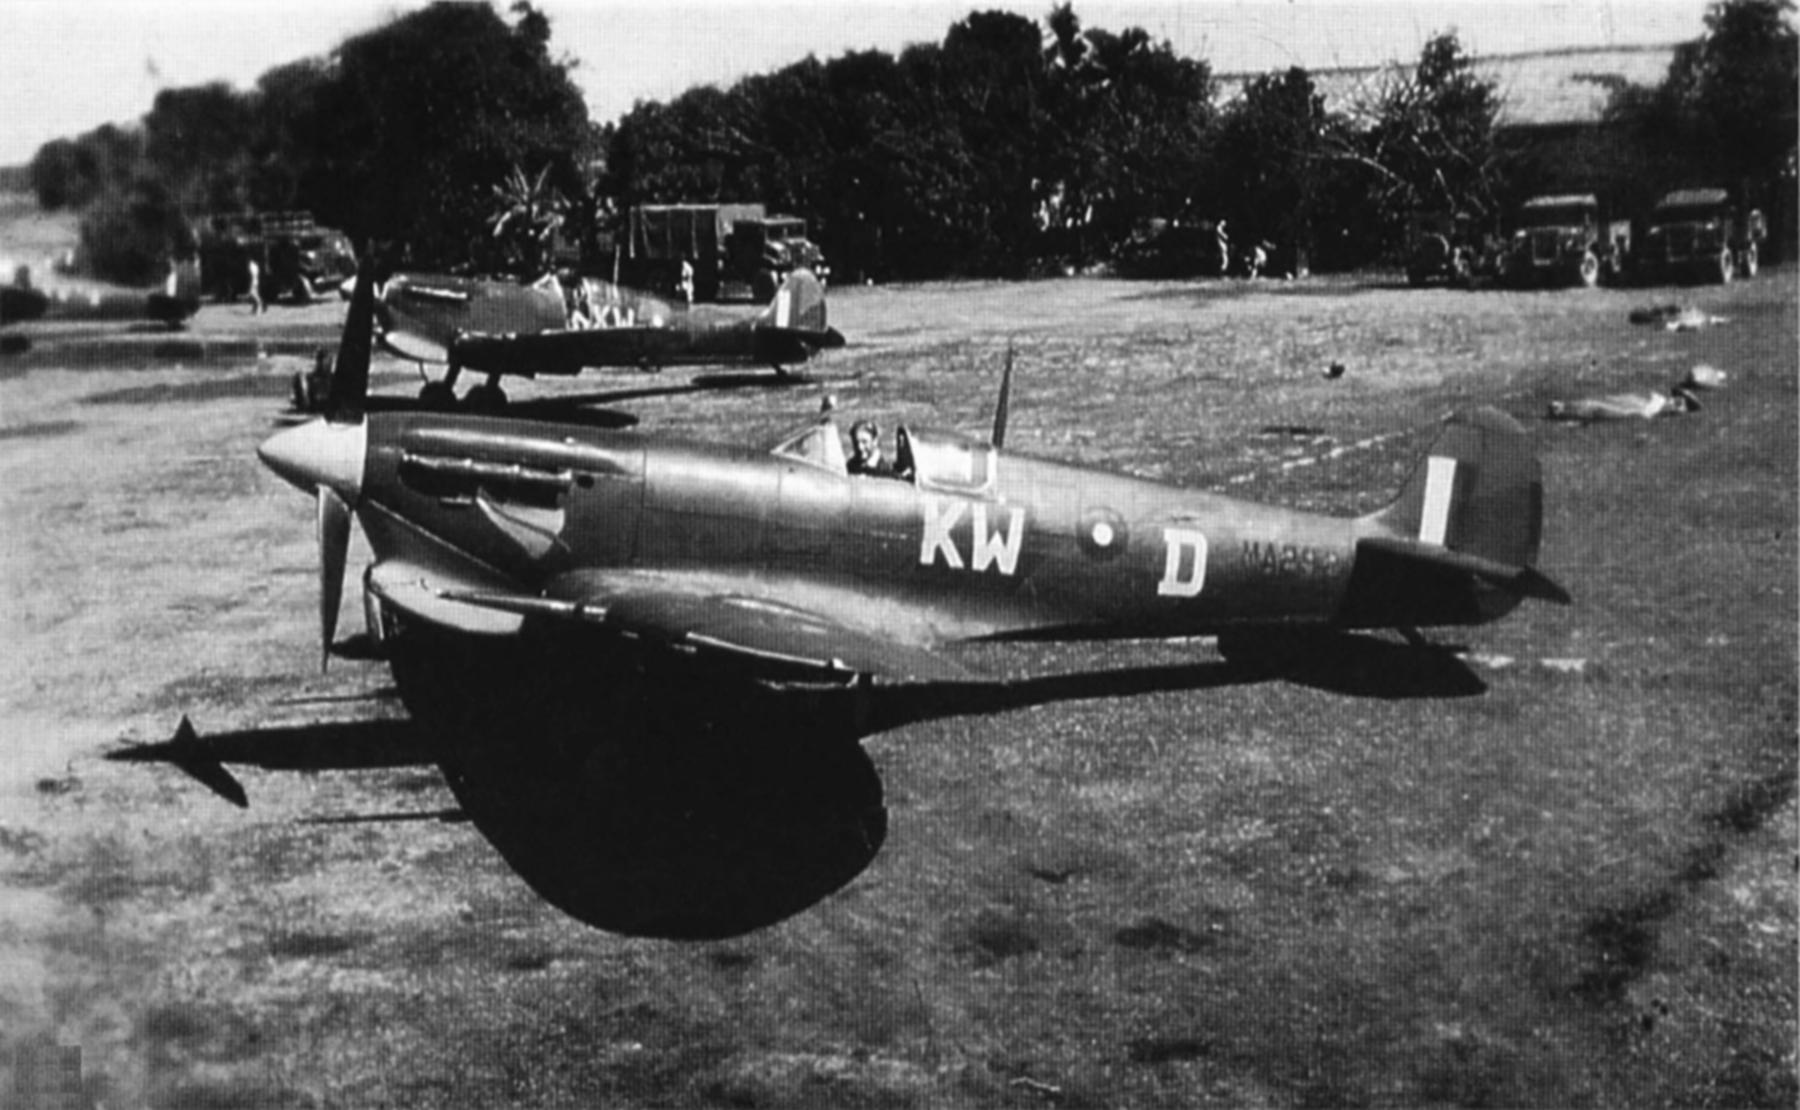 Spitfire MkVcTrop RAF 615Sqn KWD Lawrence Weggery MA292 Bengal India 1943 02